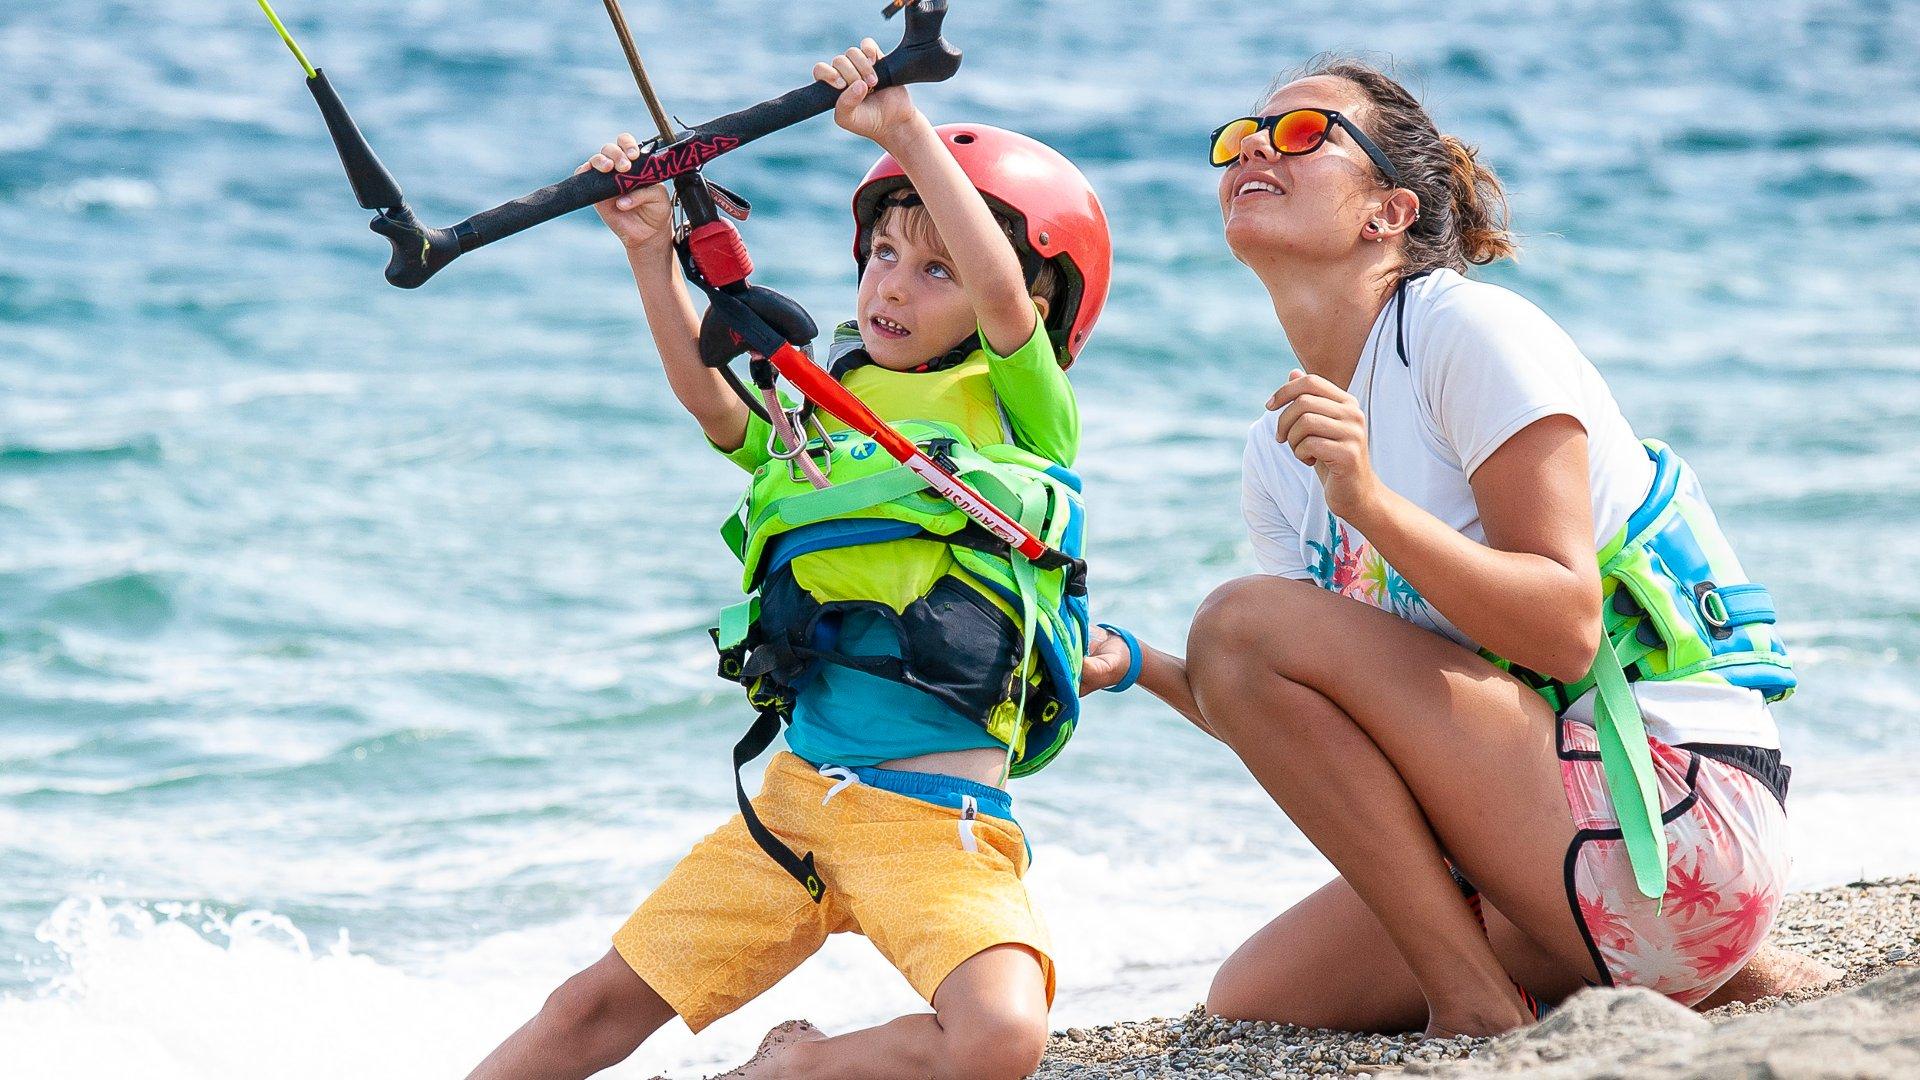 Children kitesurfing lessons in Greece Evia Island